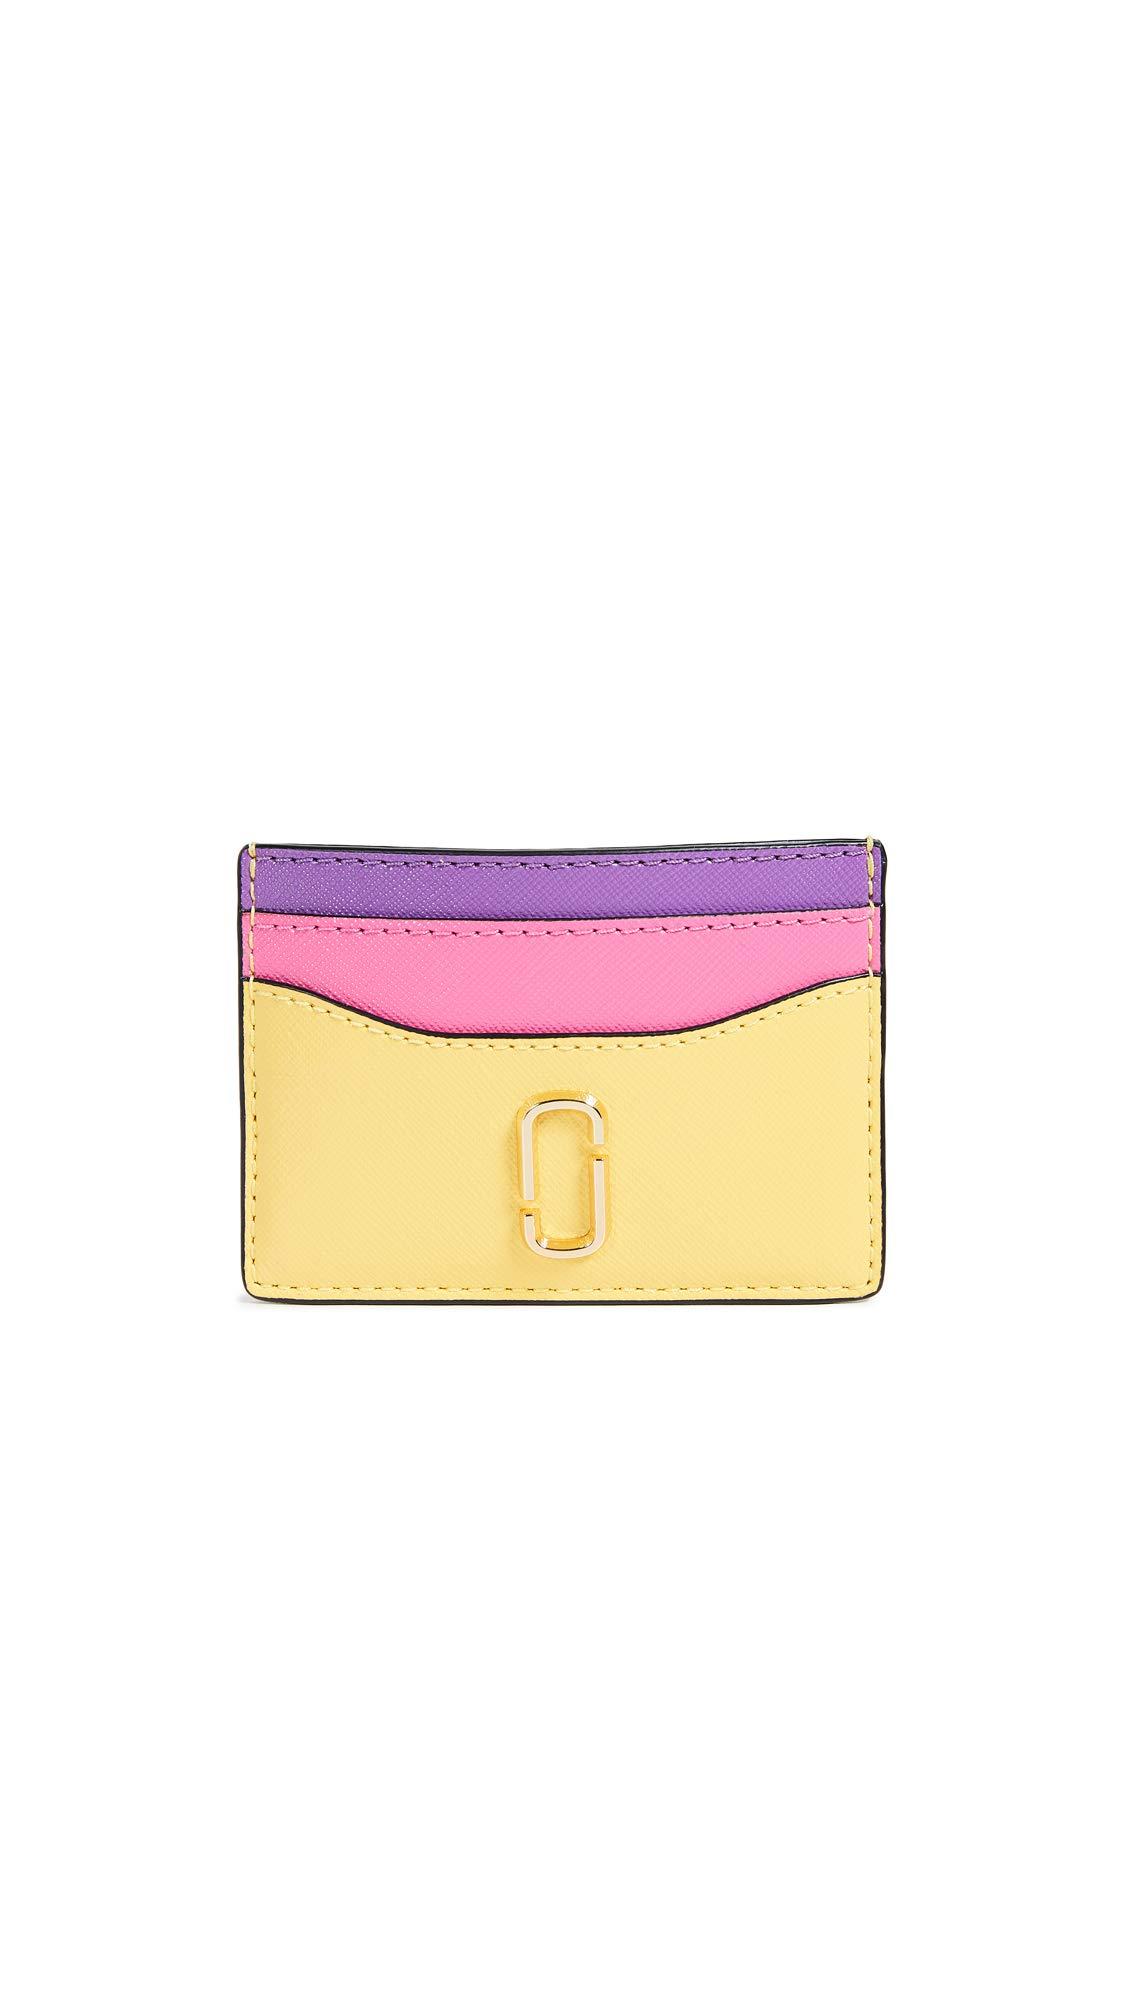 Marc Jacobs Women's Snapshot Card Case, Lemon Multi, One Size by Marc Jacobs